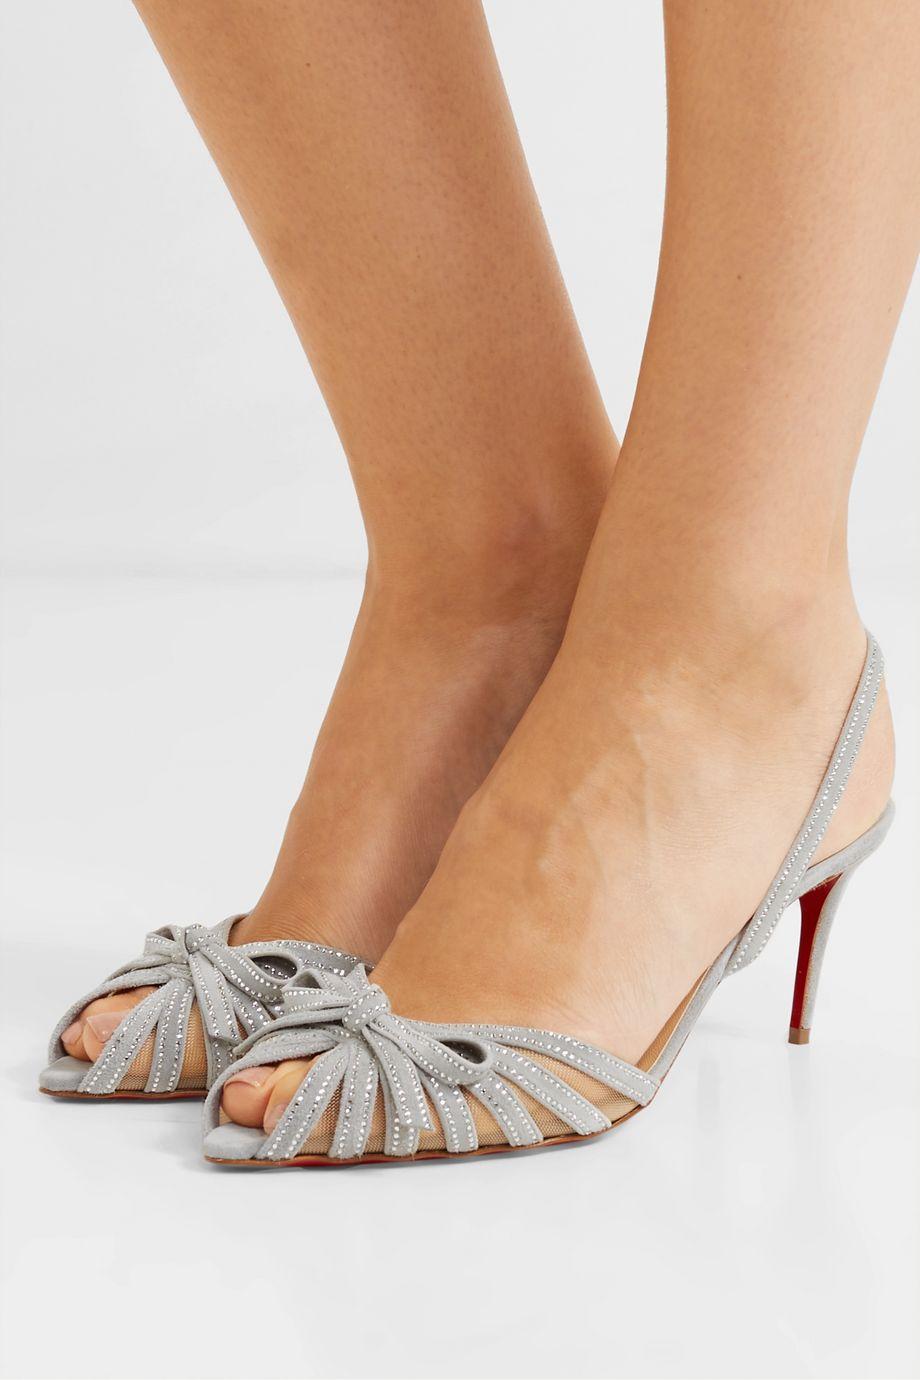 Christian Louboutin Araborda 70 crystal-embellished suede and mesh slingback sandals